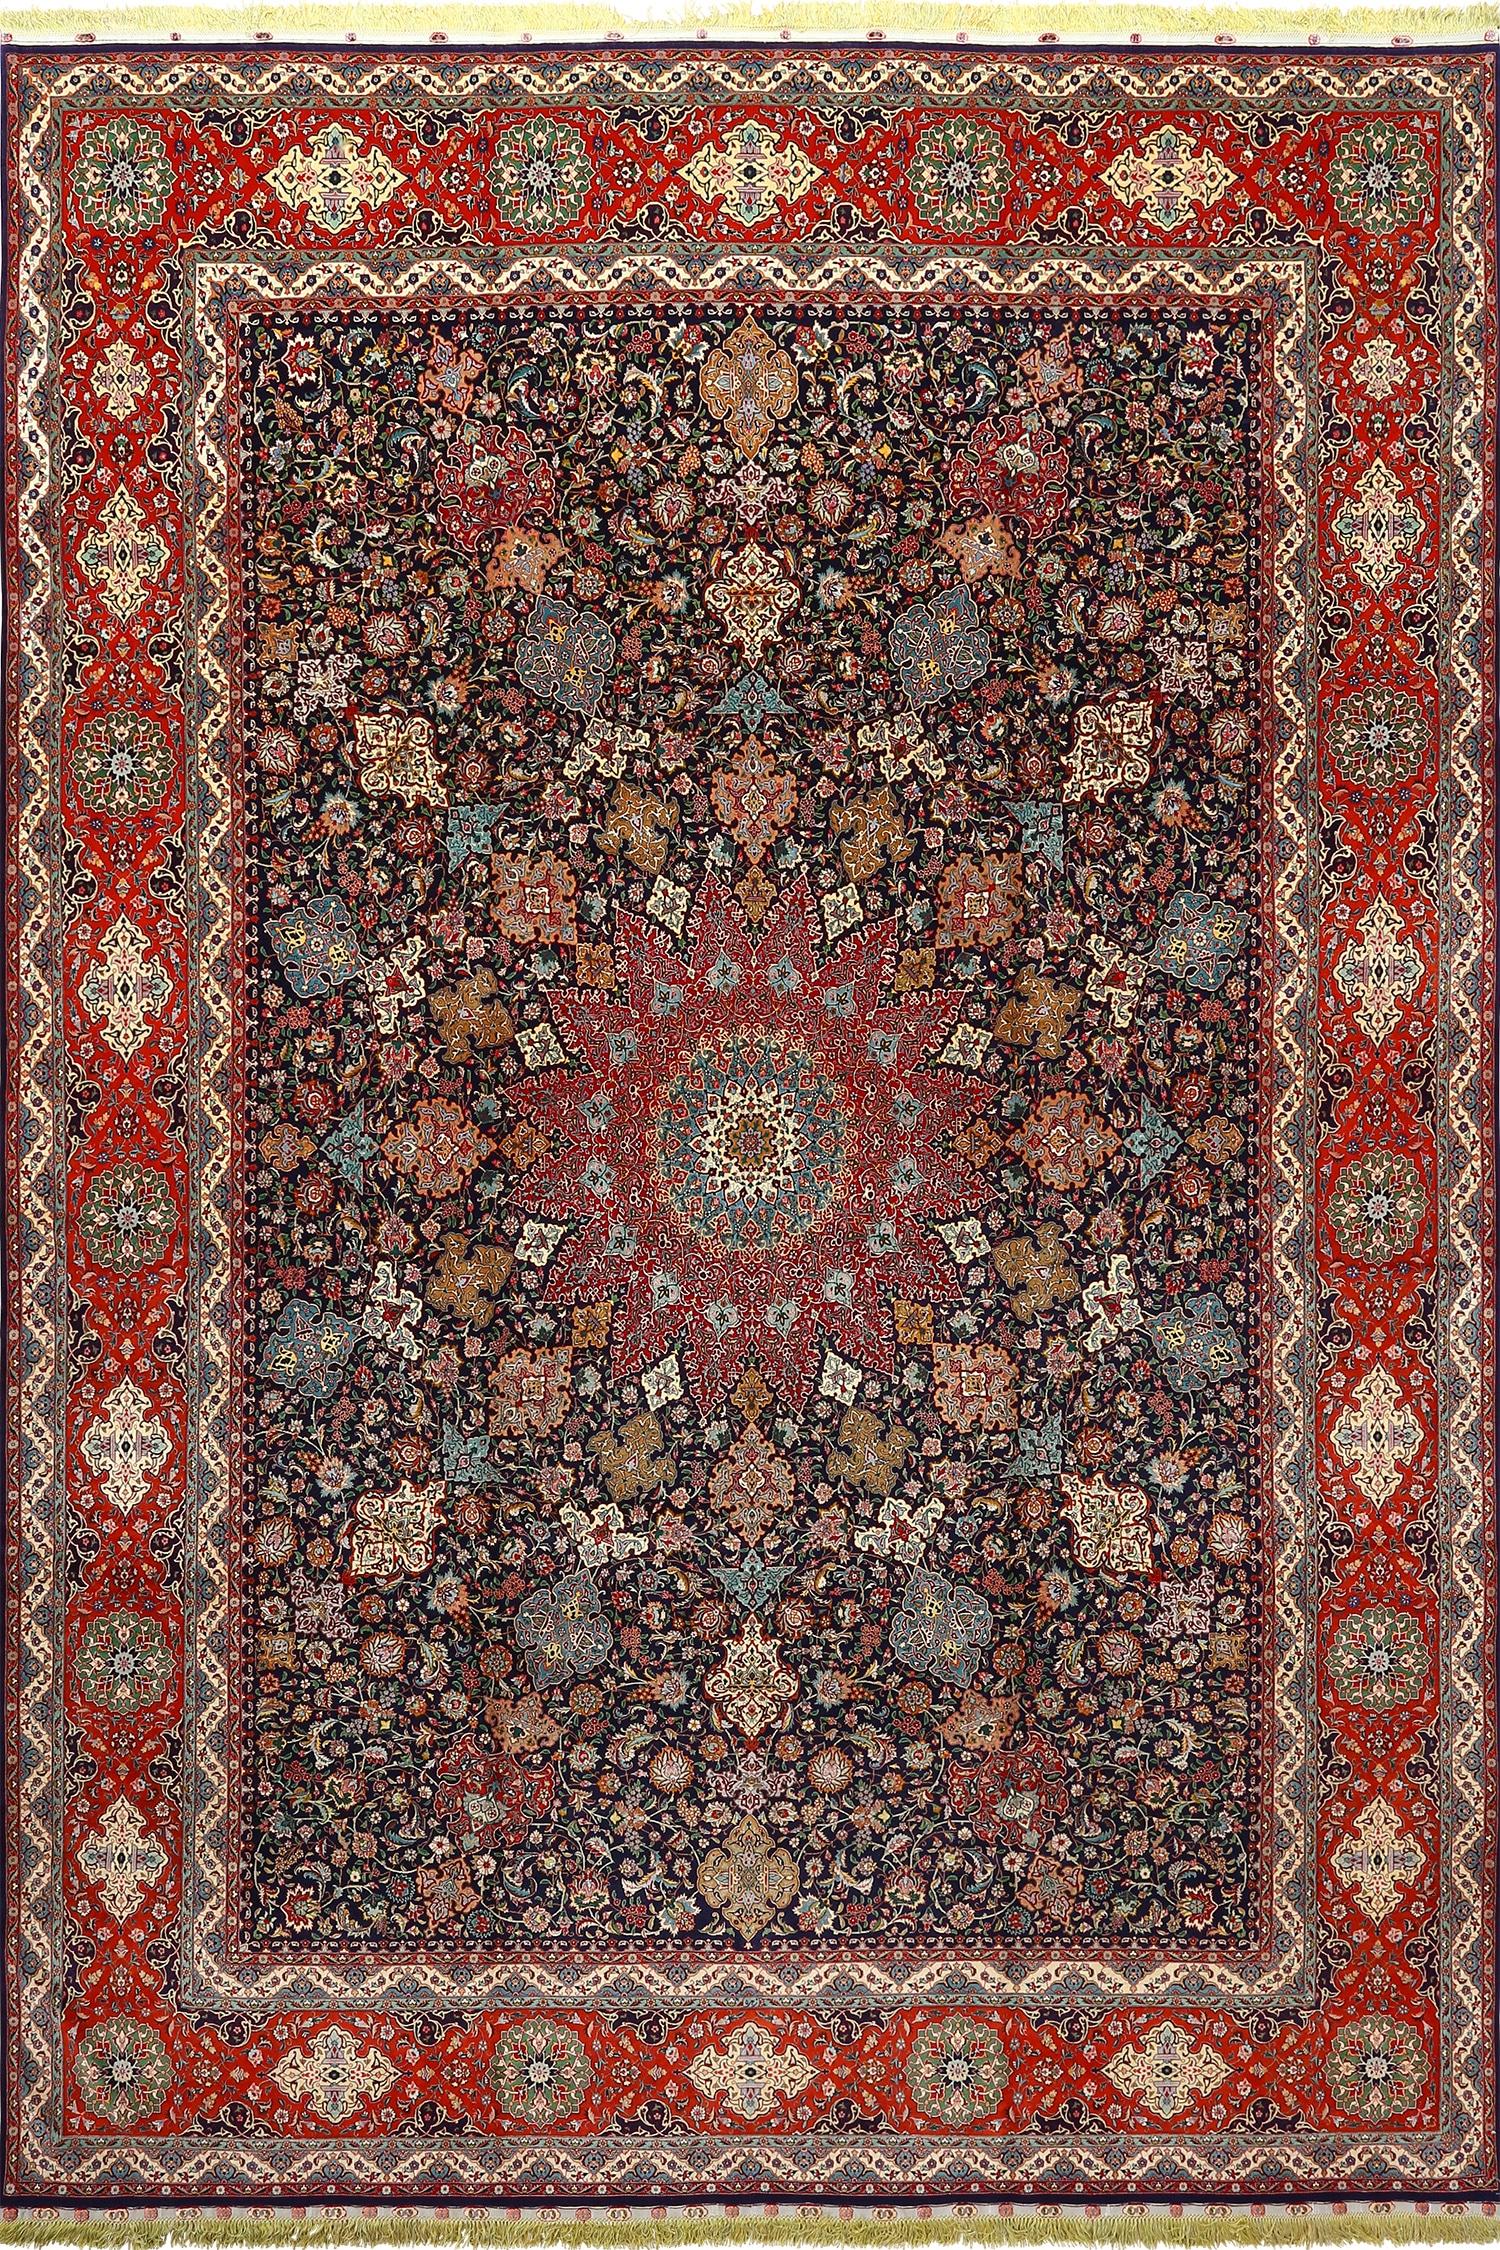 fine-zohreh-design-vintage-tabriz-persian-rug-51047-1.jpg